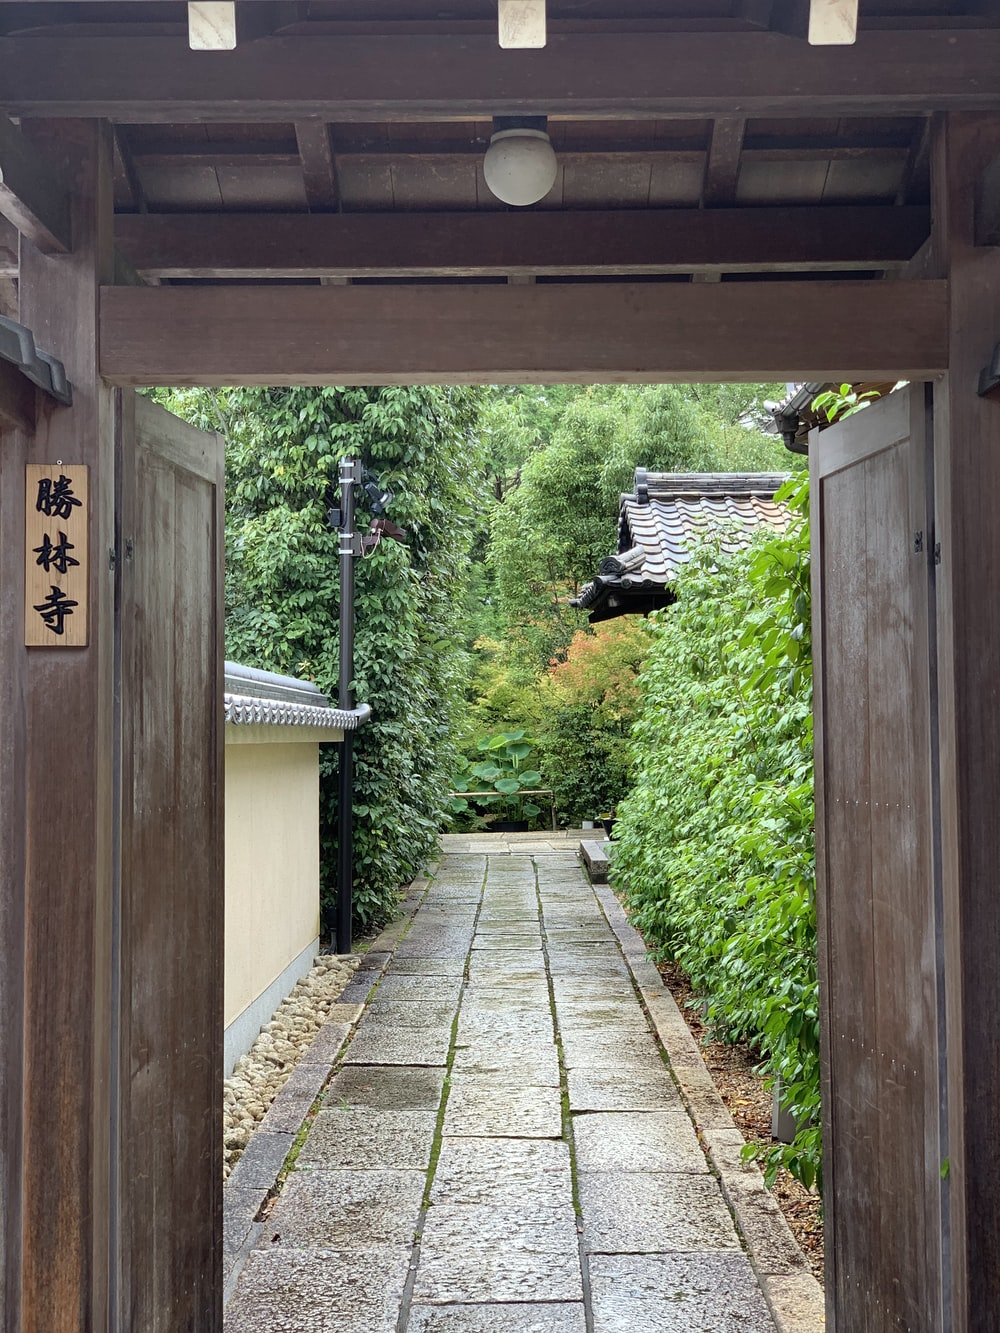 brown wooden pathway between green plants during daytime